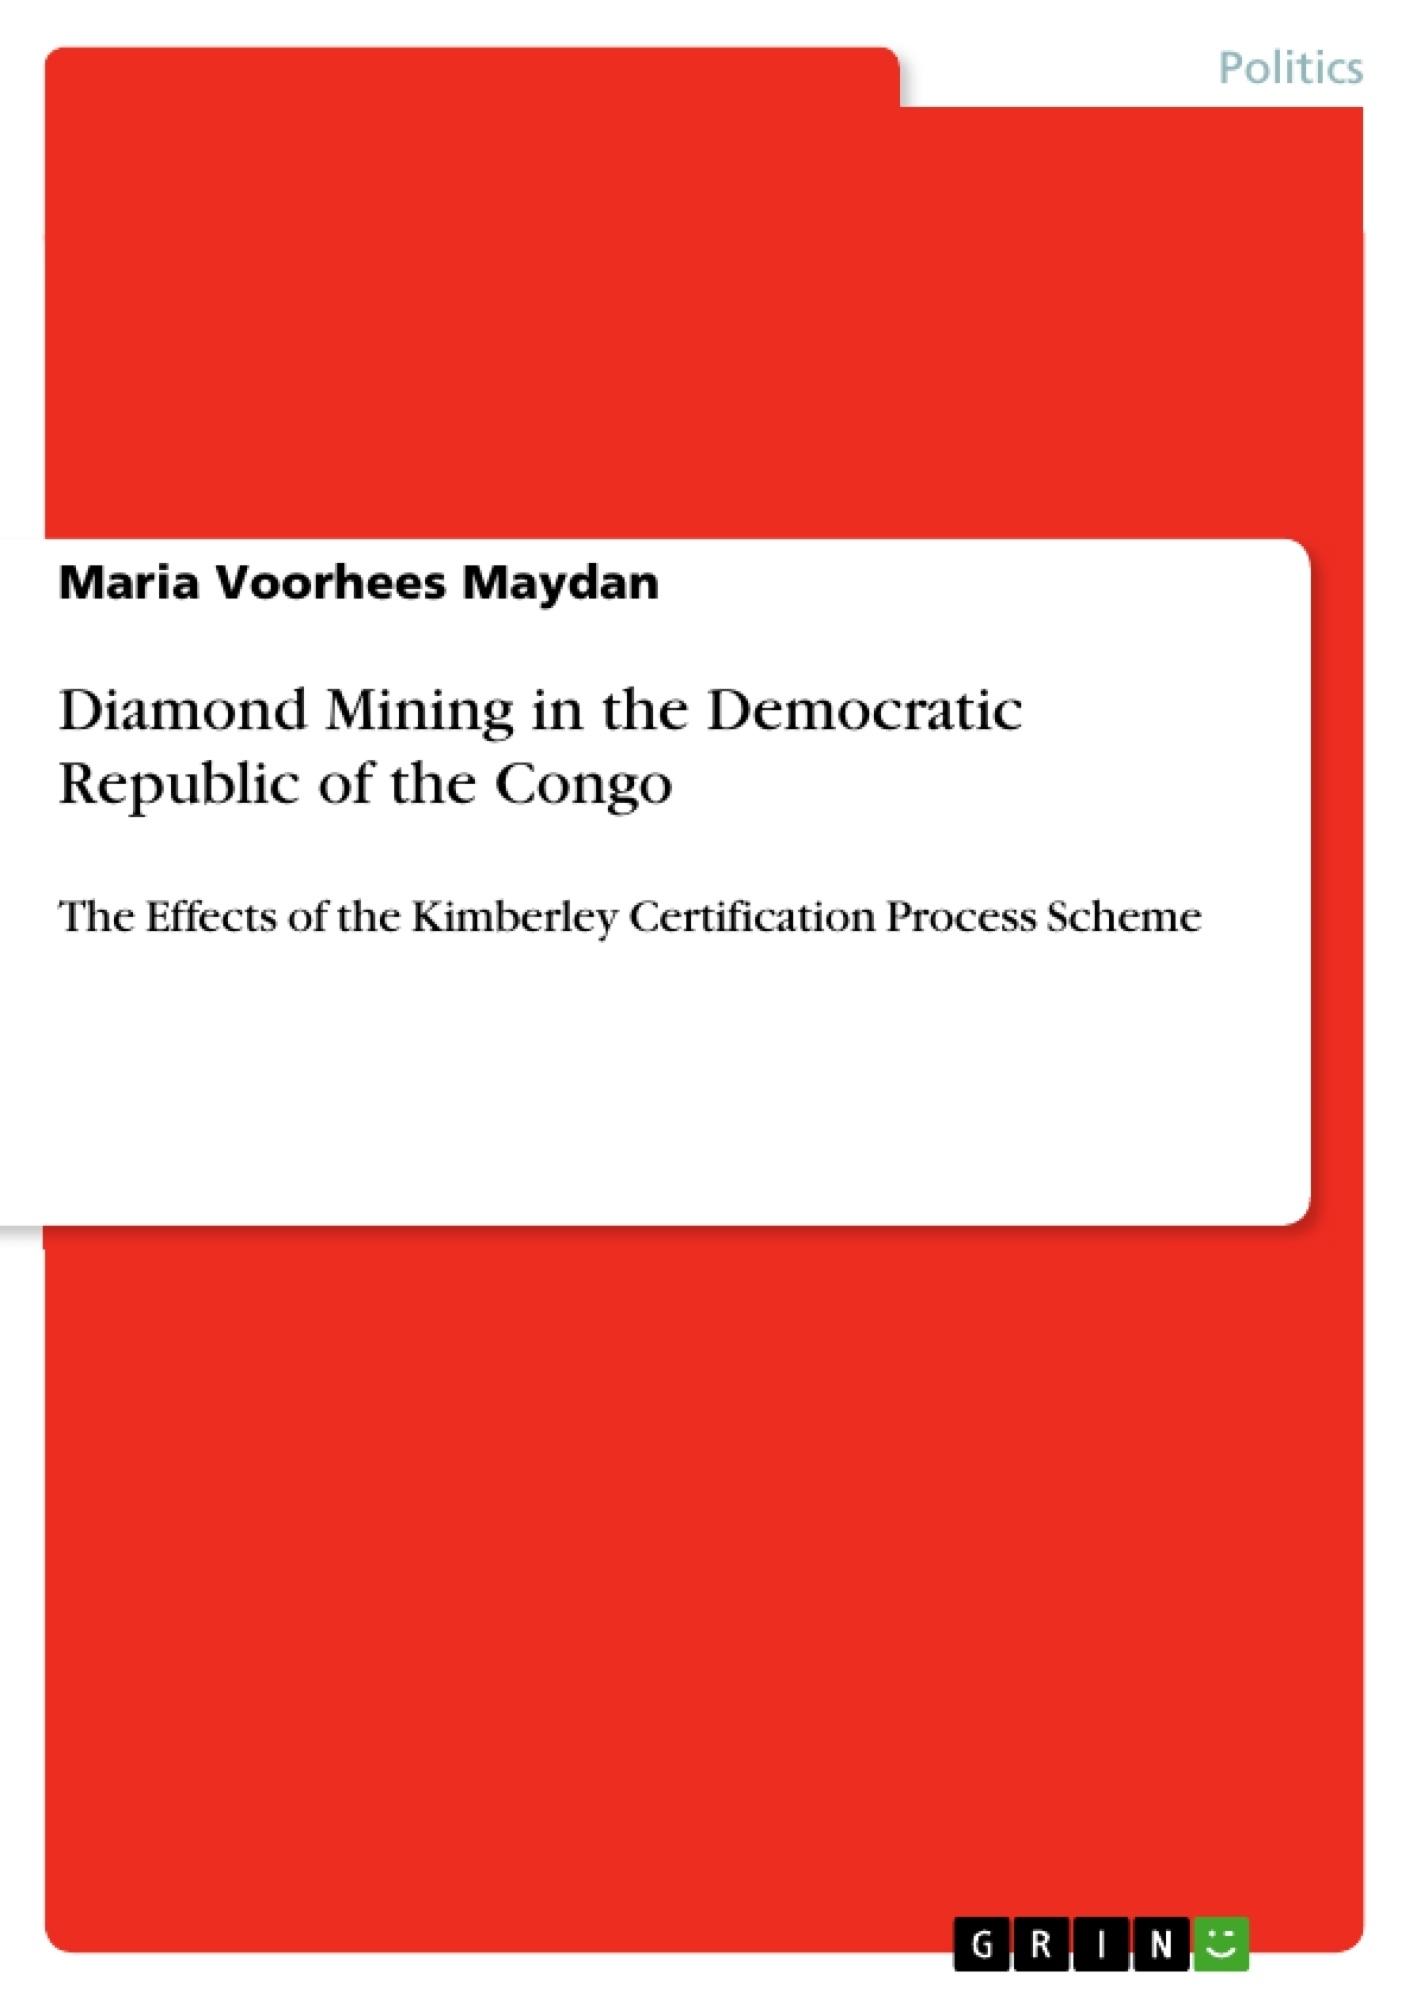 Title: Diamond Mining in the Democratic Republic of the Congo